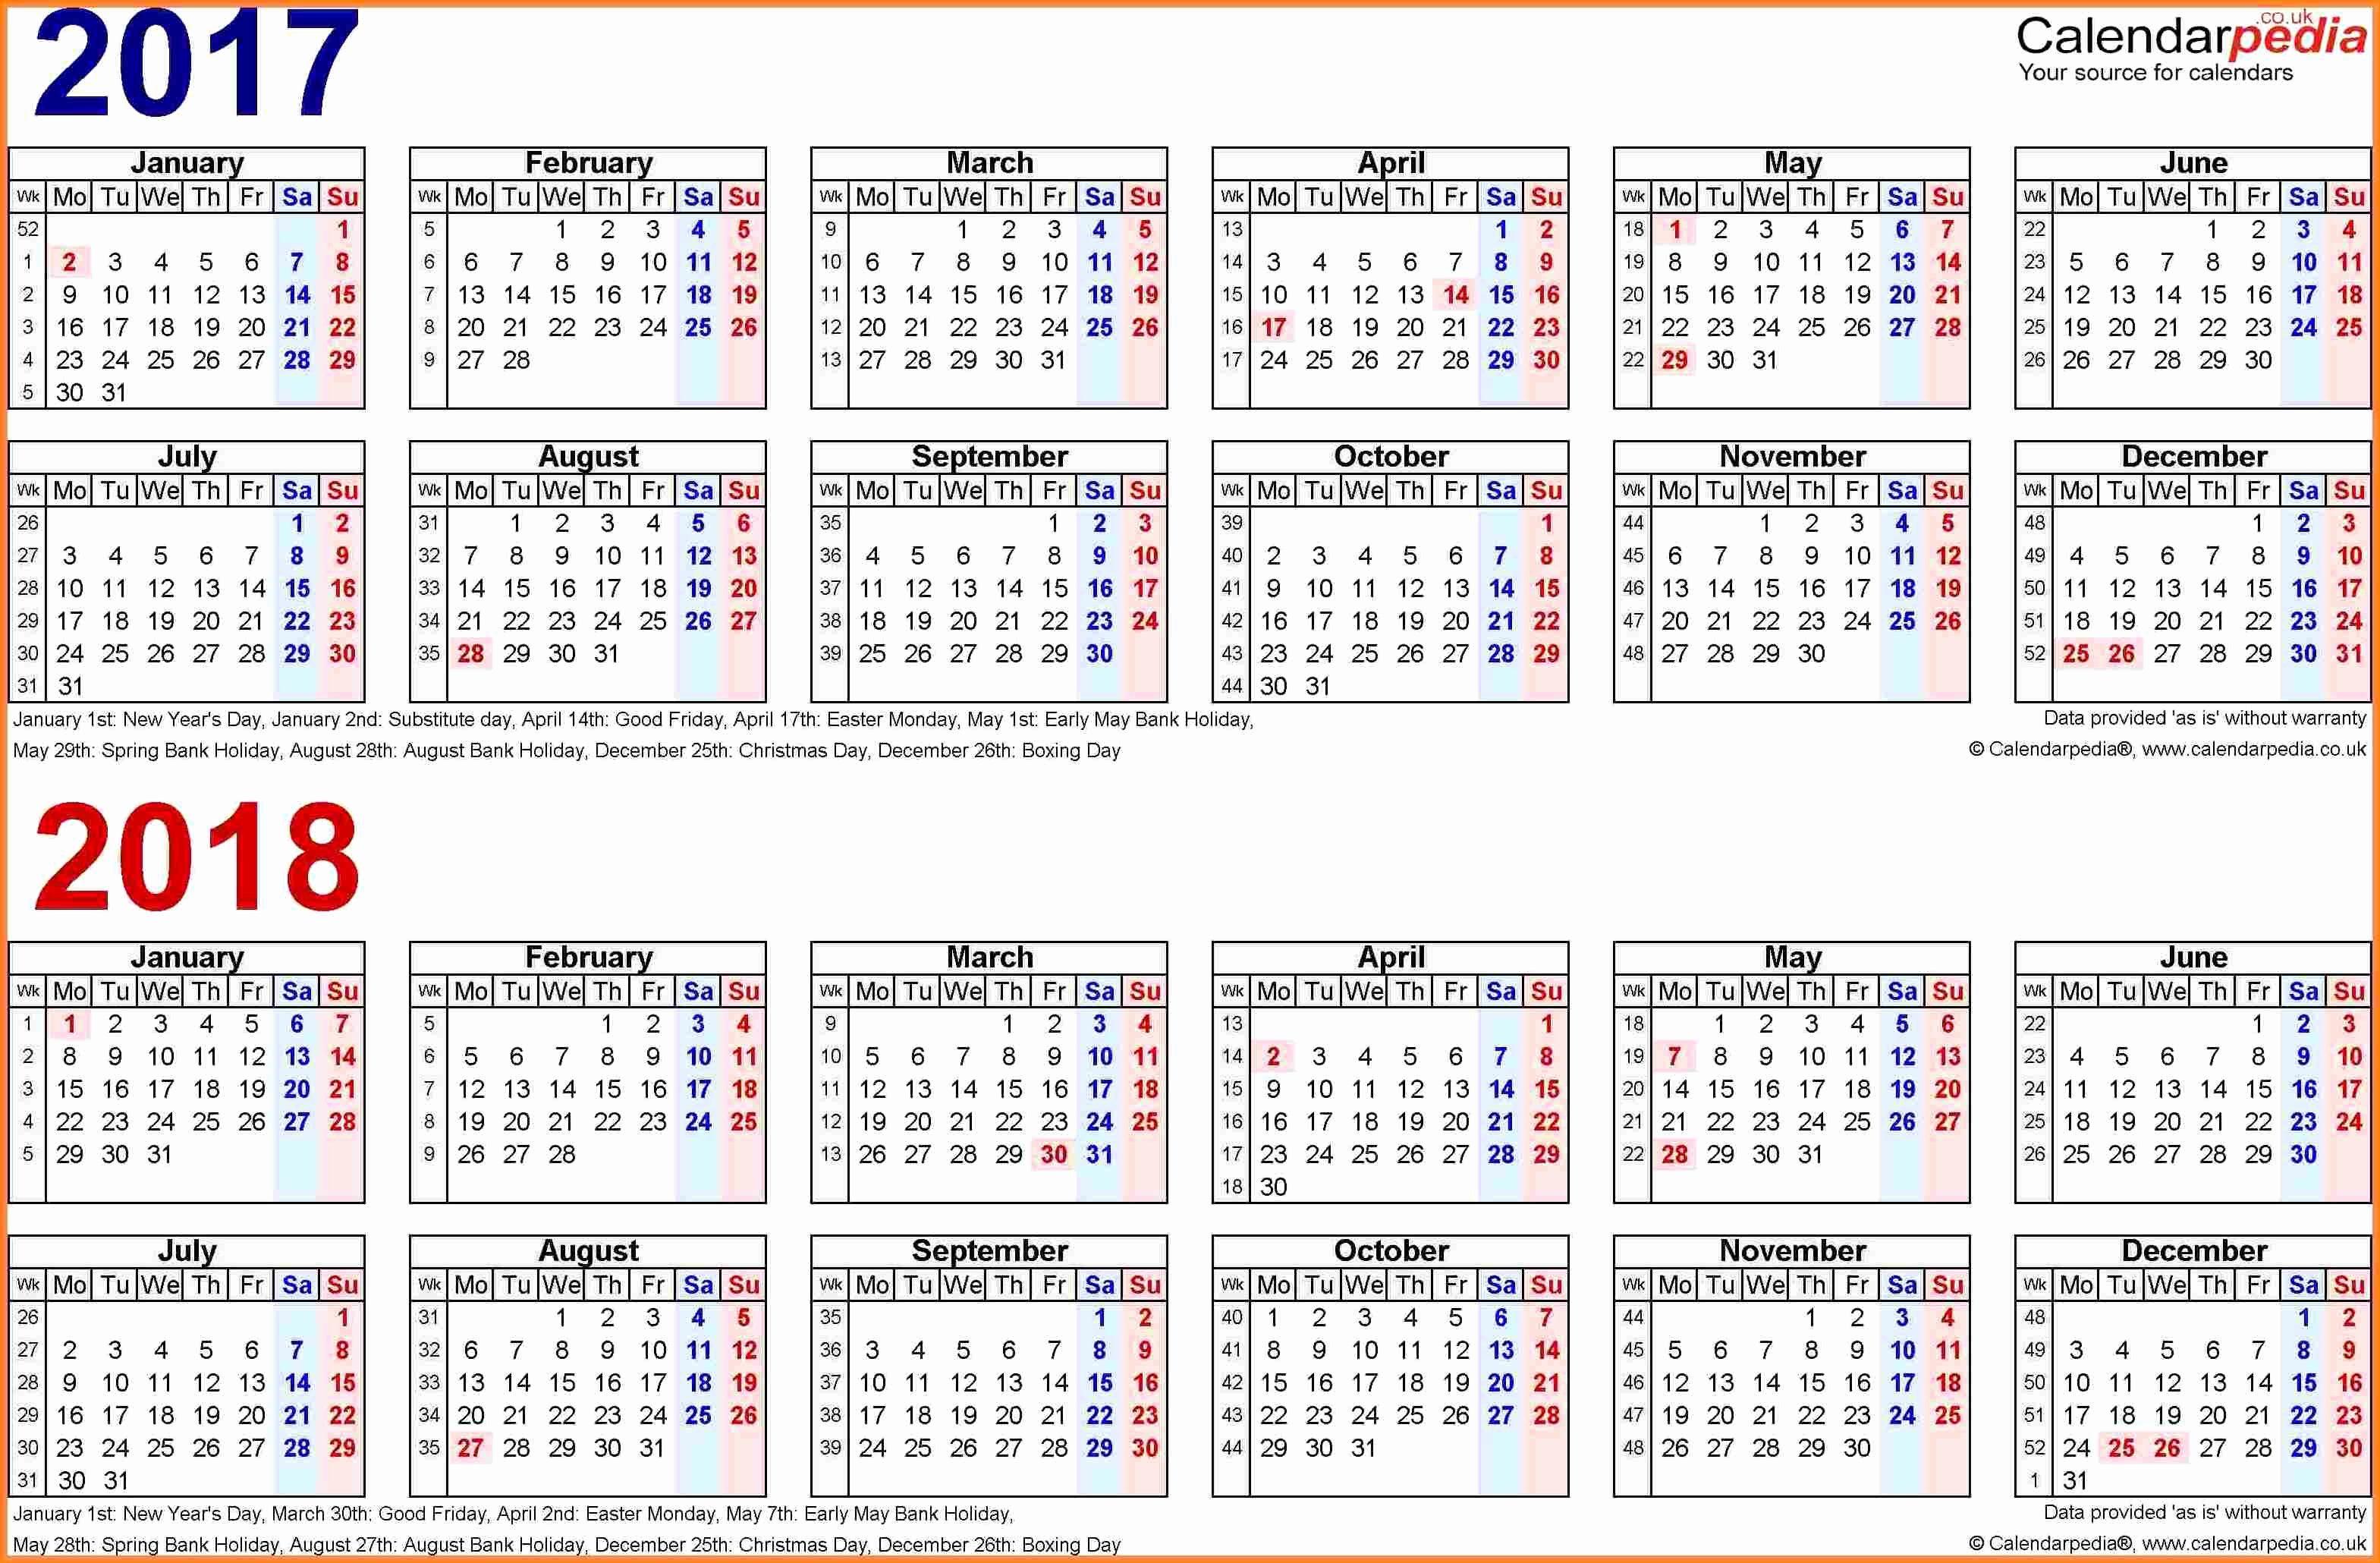 Biweekly Payroll Calendar Template 2017 Lovely 12 Payroll Calendar Template 2017